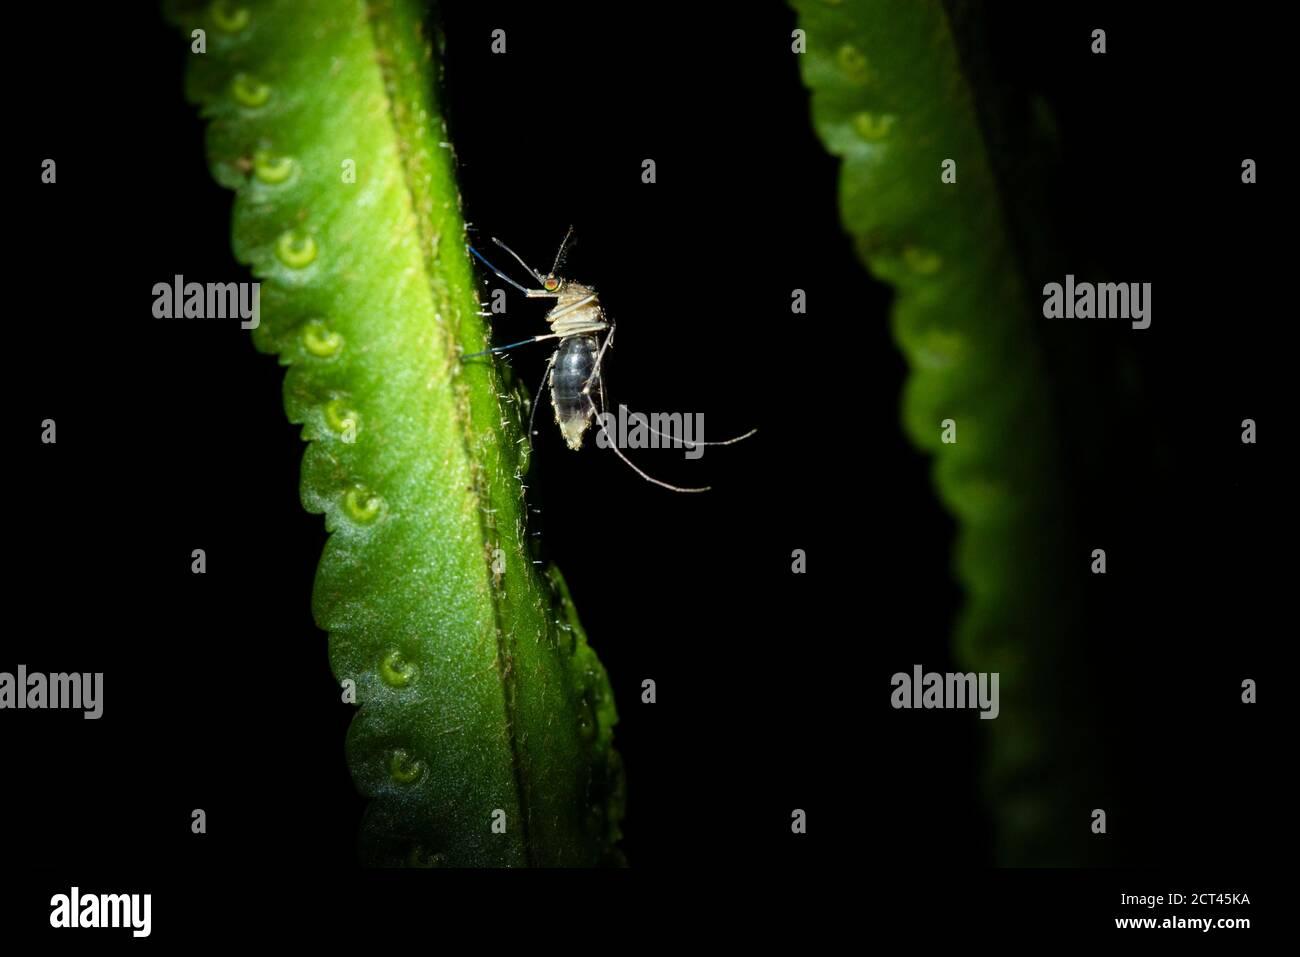 Gran Mosquito, Boca tapada, Provincia de Alajuela, Costa Rica Foto de stock